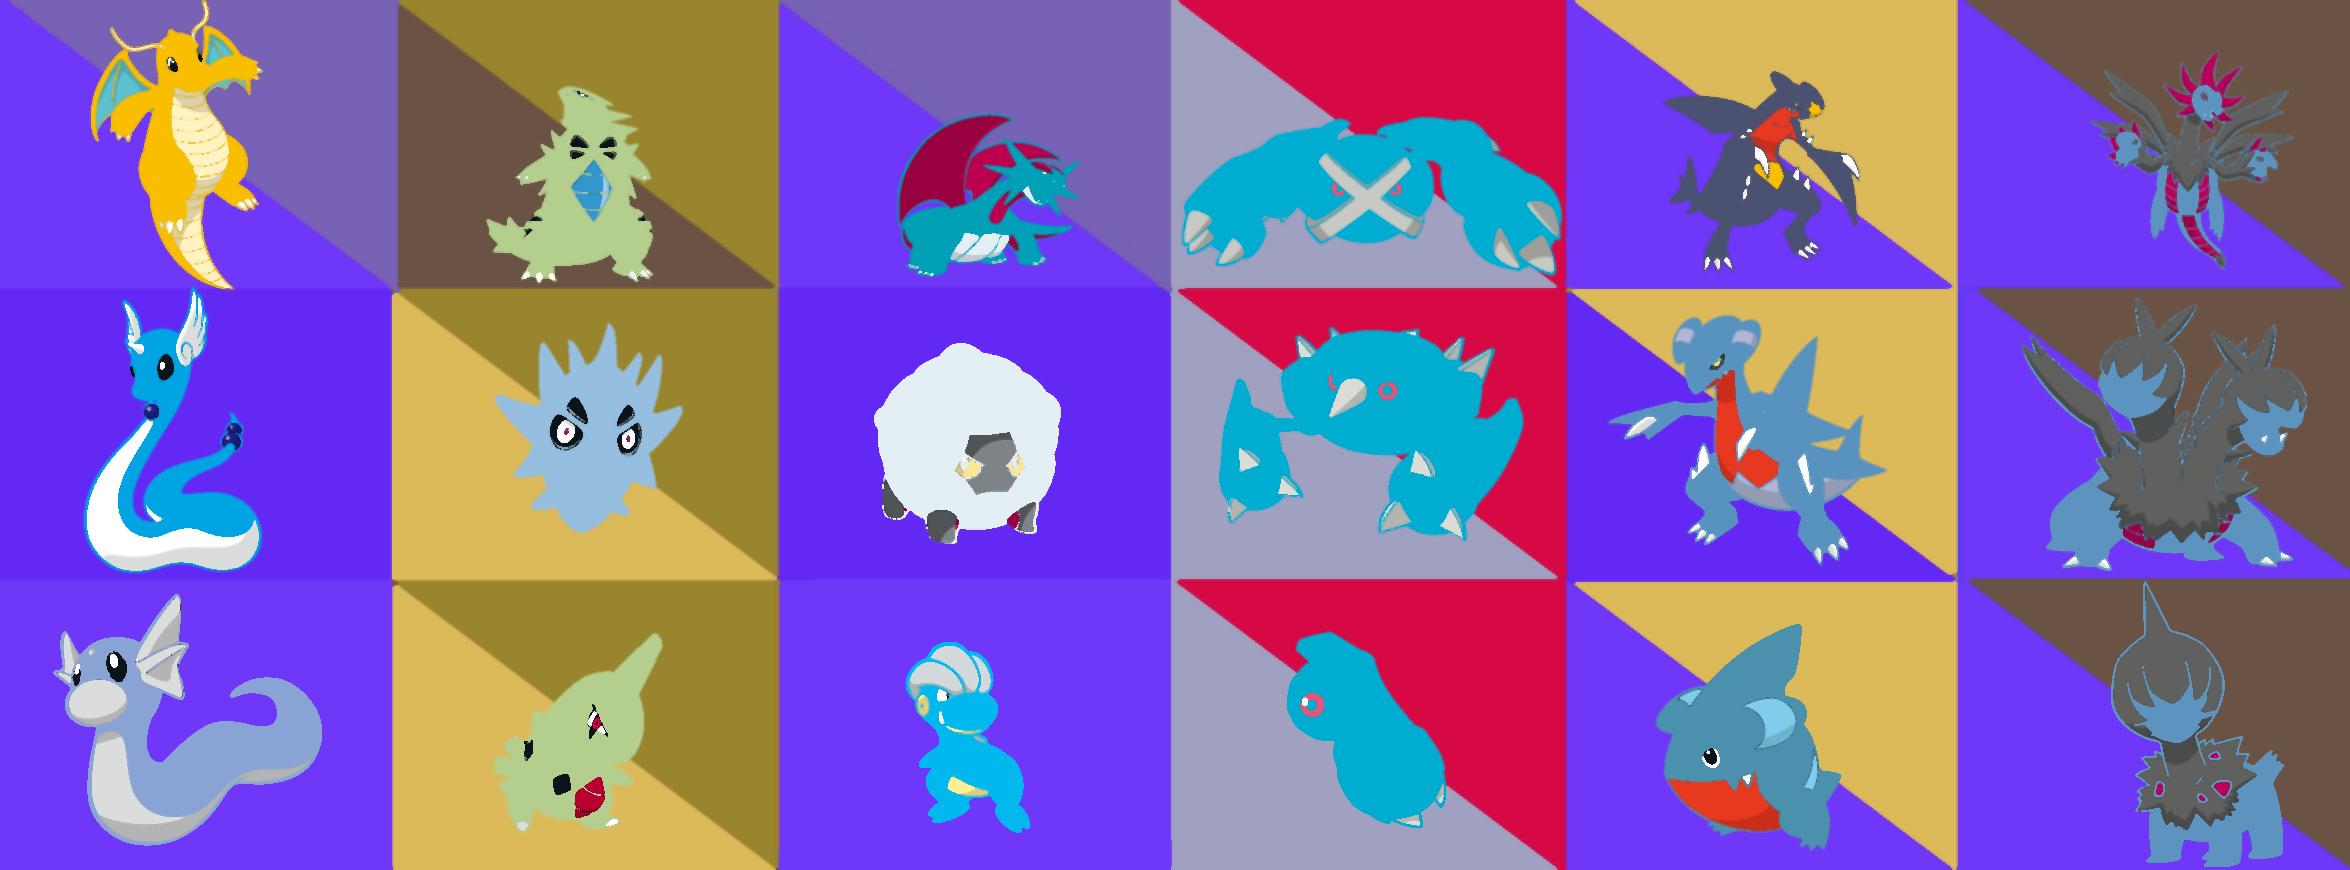 how to get level 1 legendary pokemon